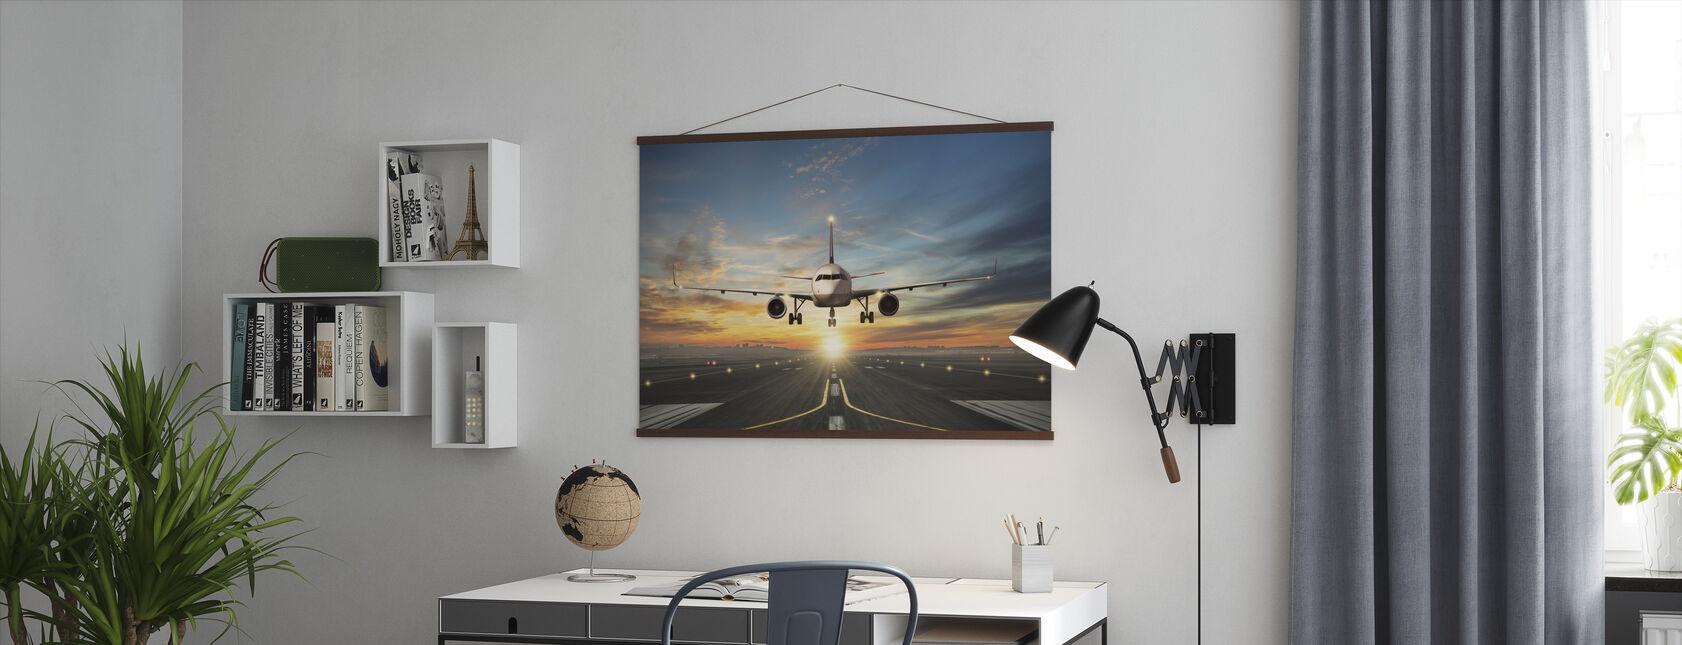 Sunset Inflight - Poster - Office